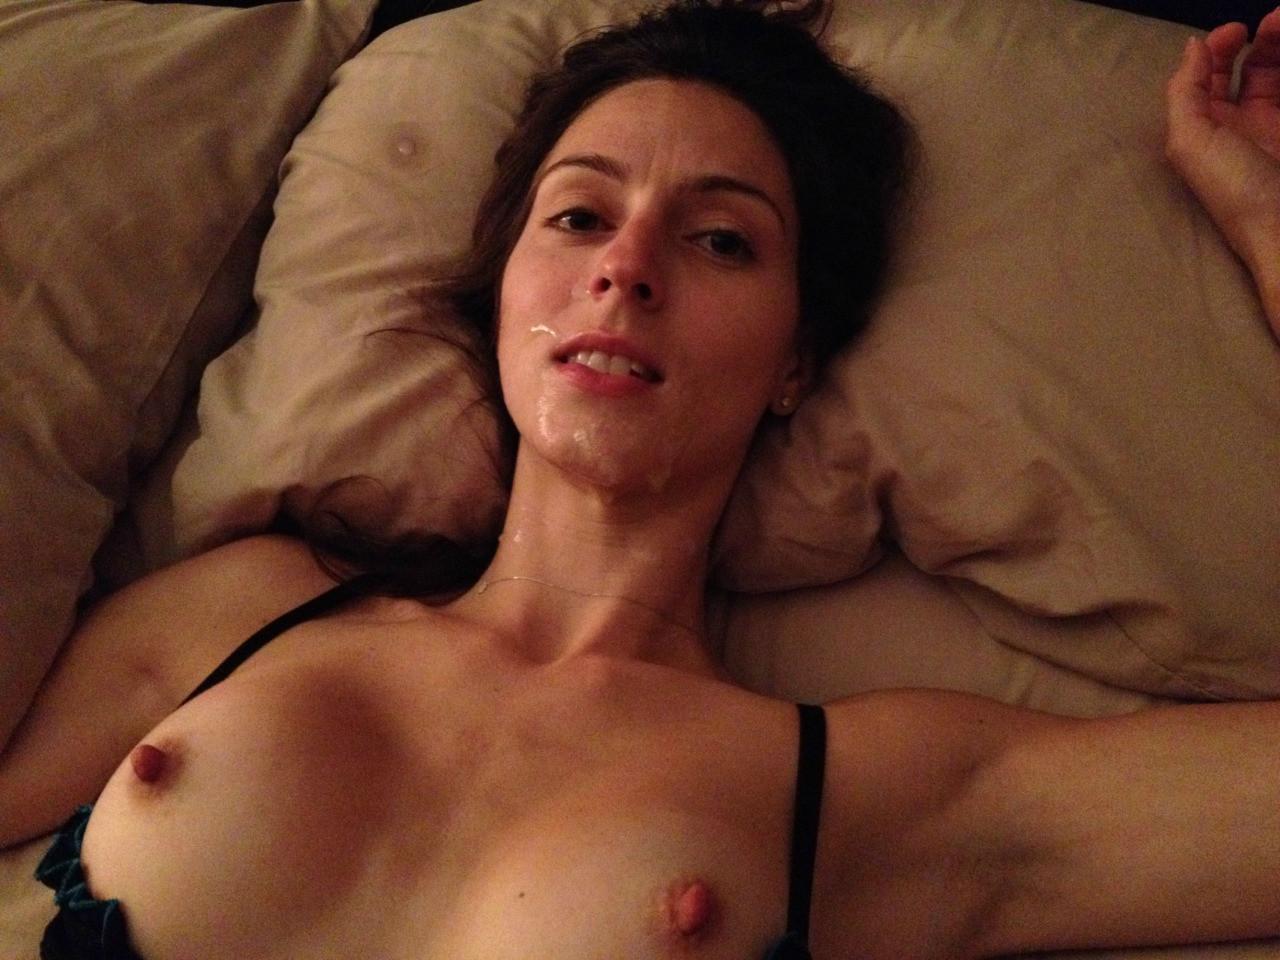 Подборка девиц с лицами в мужской сперме секс фото и порно фото